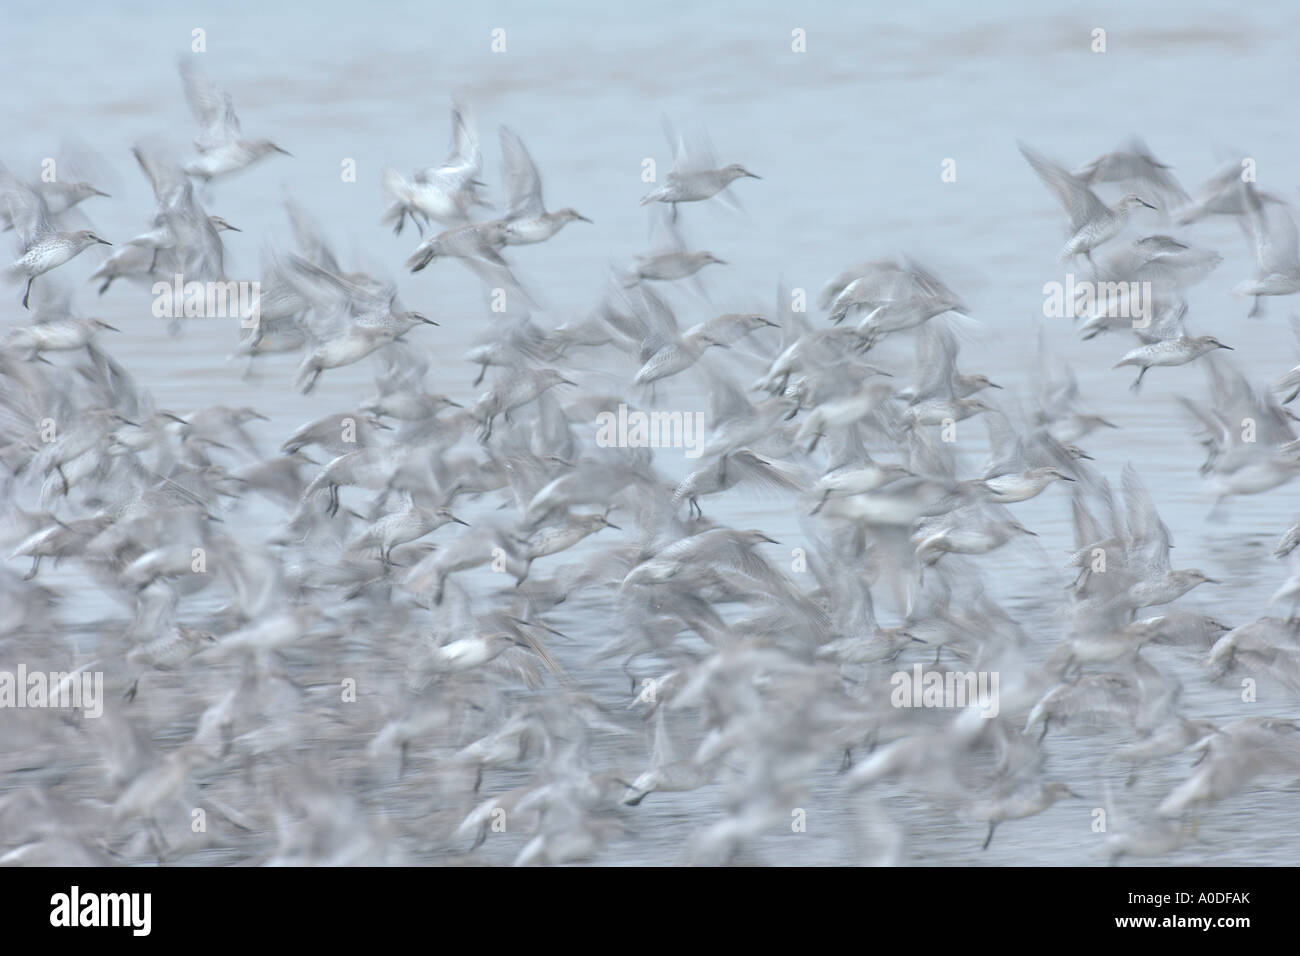 Bandada de Plumaje de invierno nudo Calidris canutus en vuelo reserva RSPB Snettisham Norfolk Inglaterra Octubre Imagen De Stock